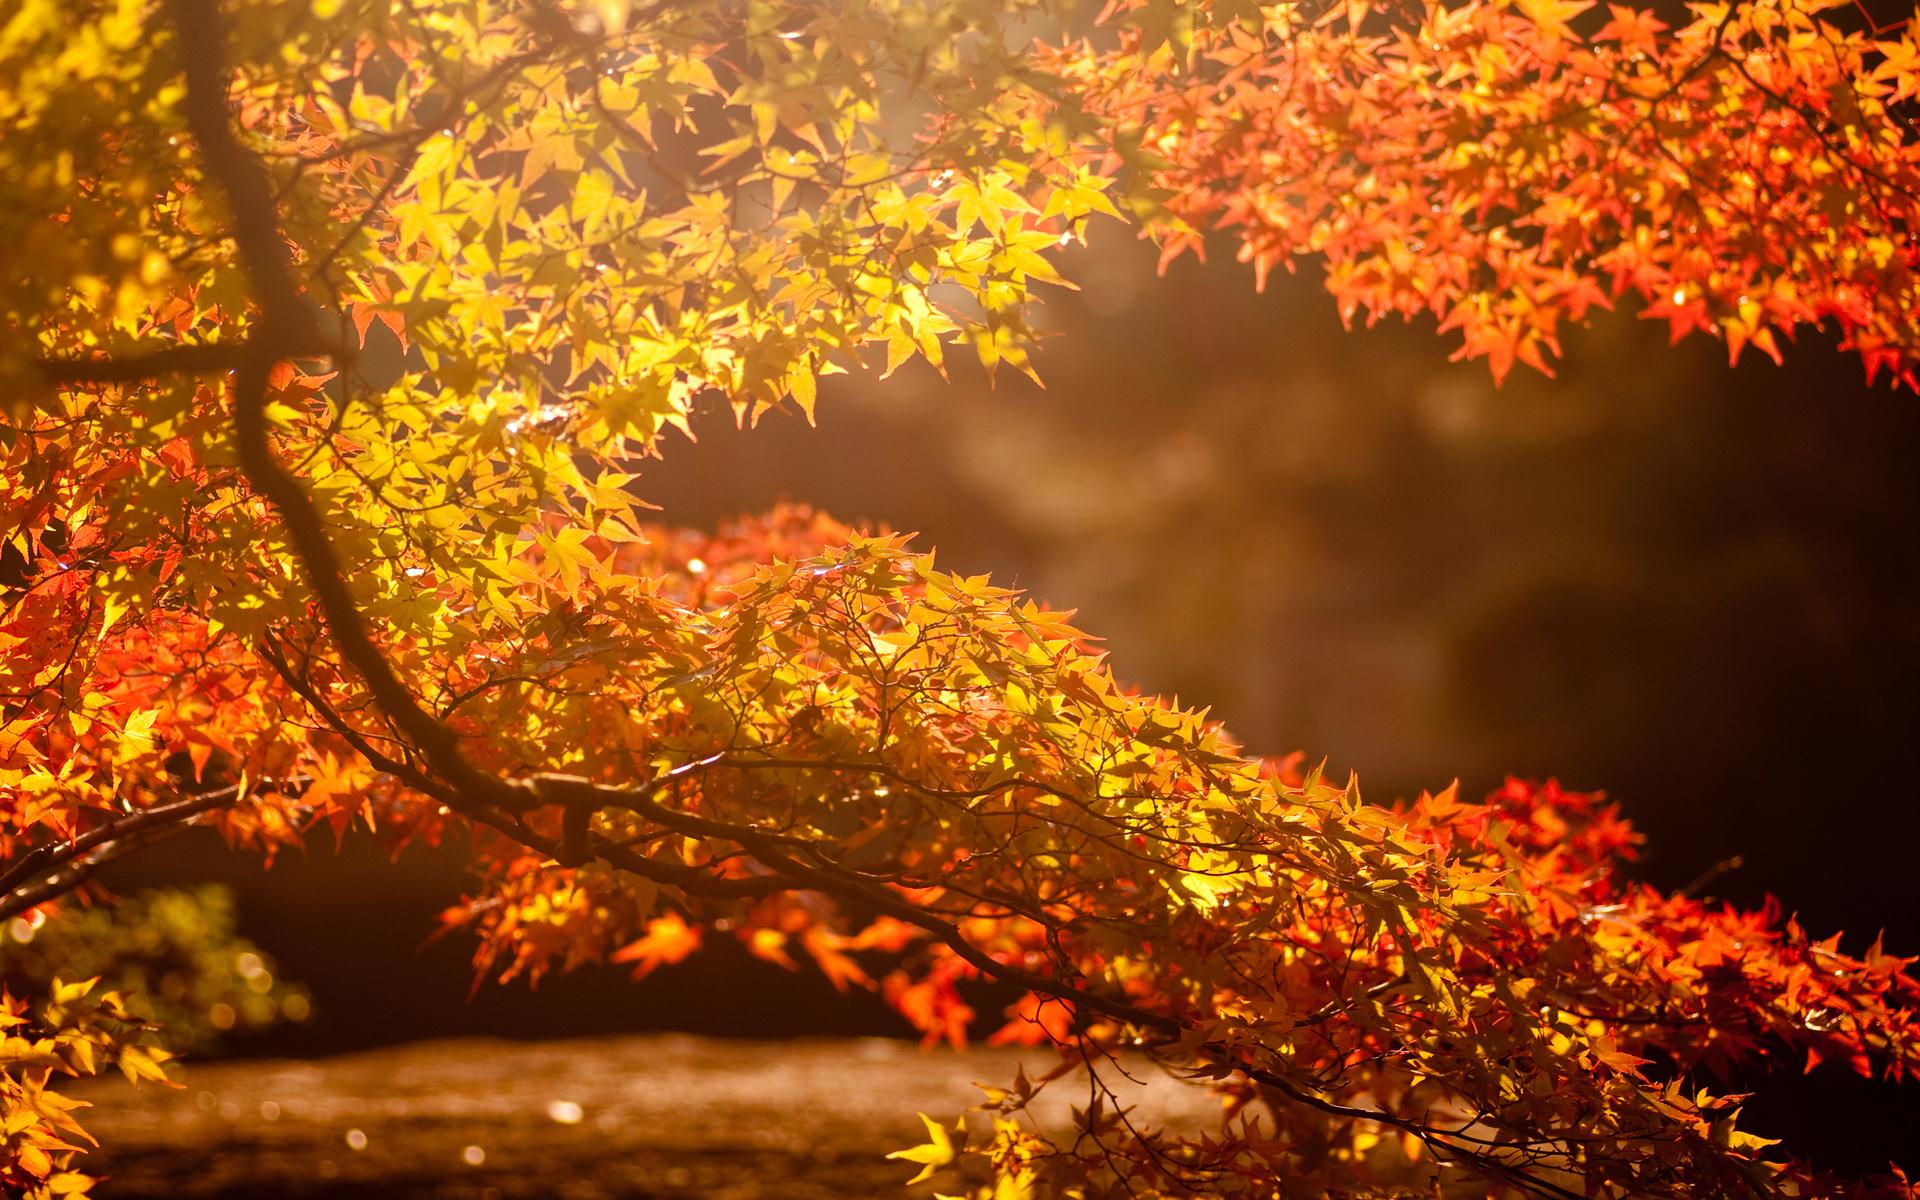 Paisajes de oto o para fondos de pantalla oto o wallpapers for Sfondi autunno hd